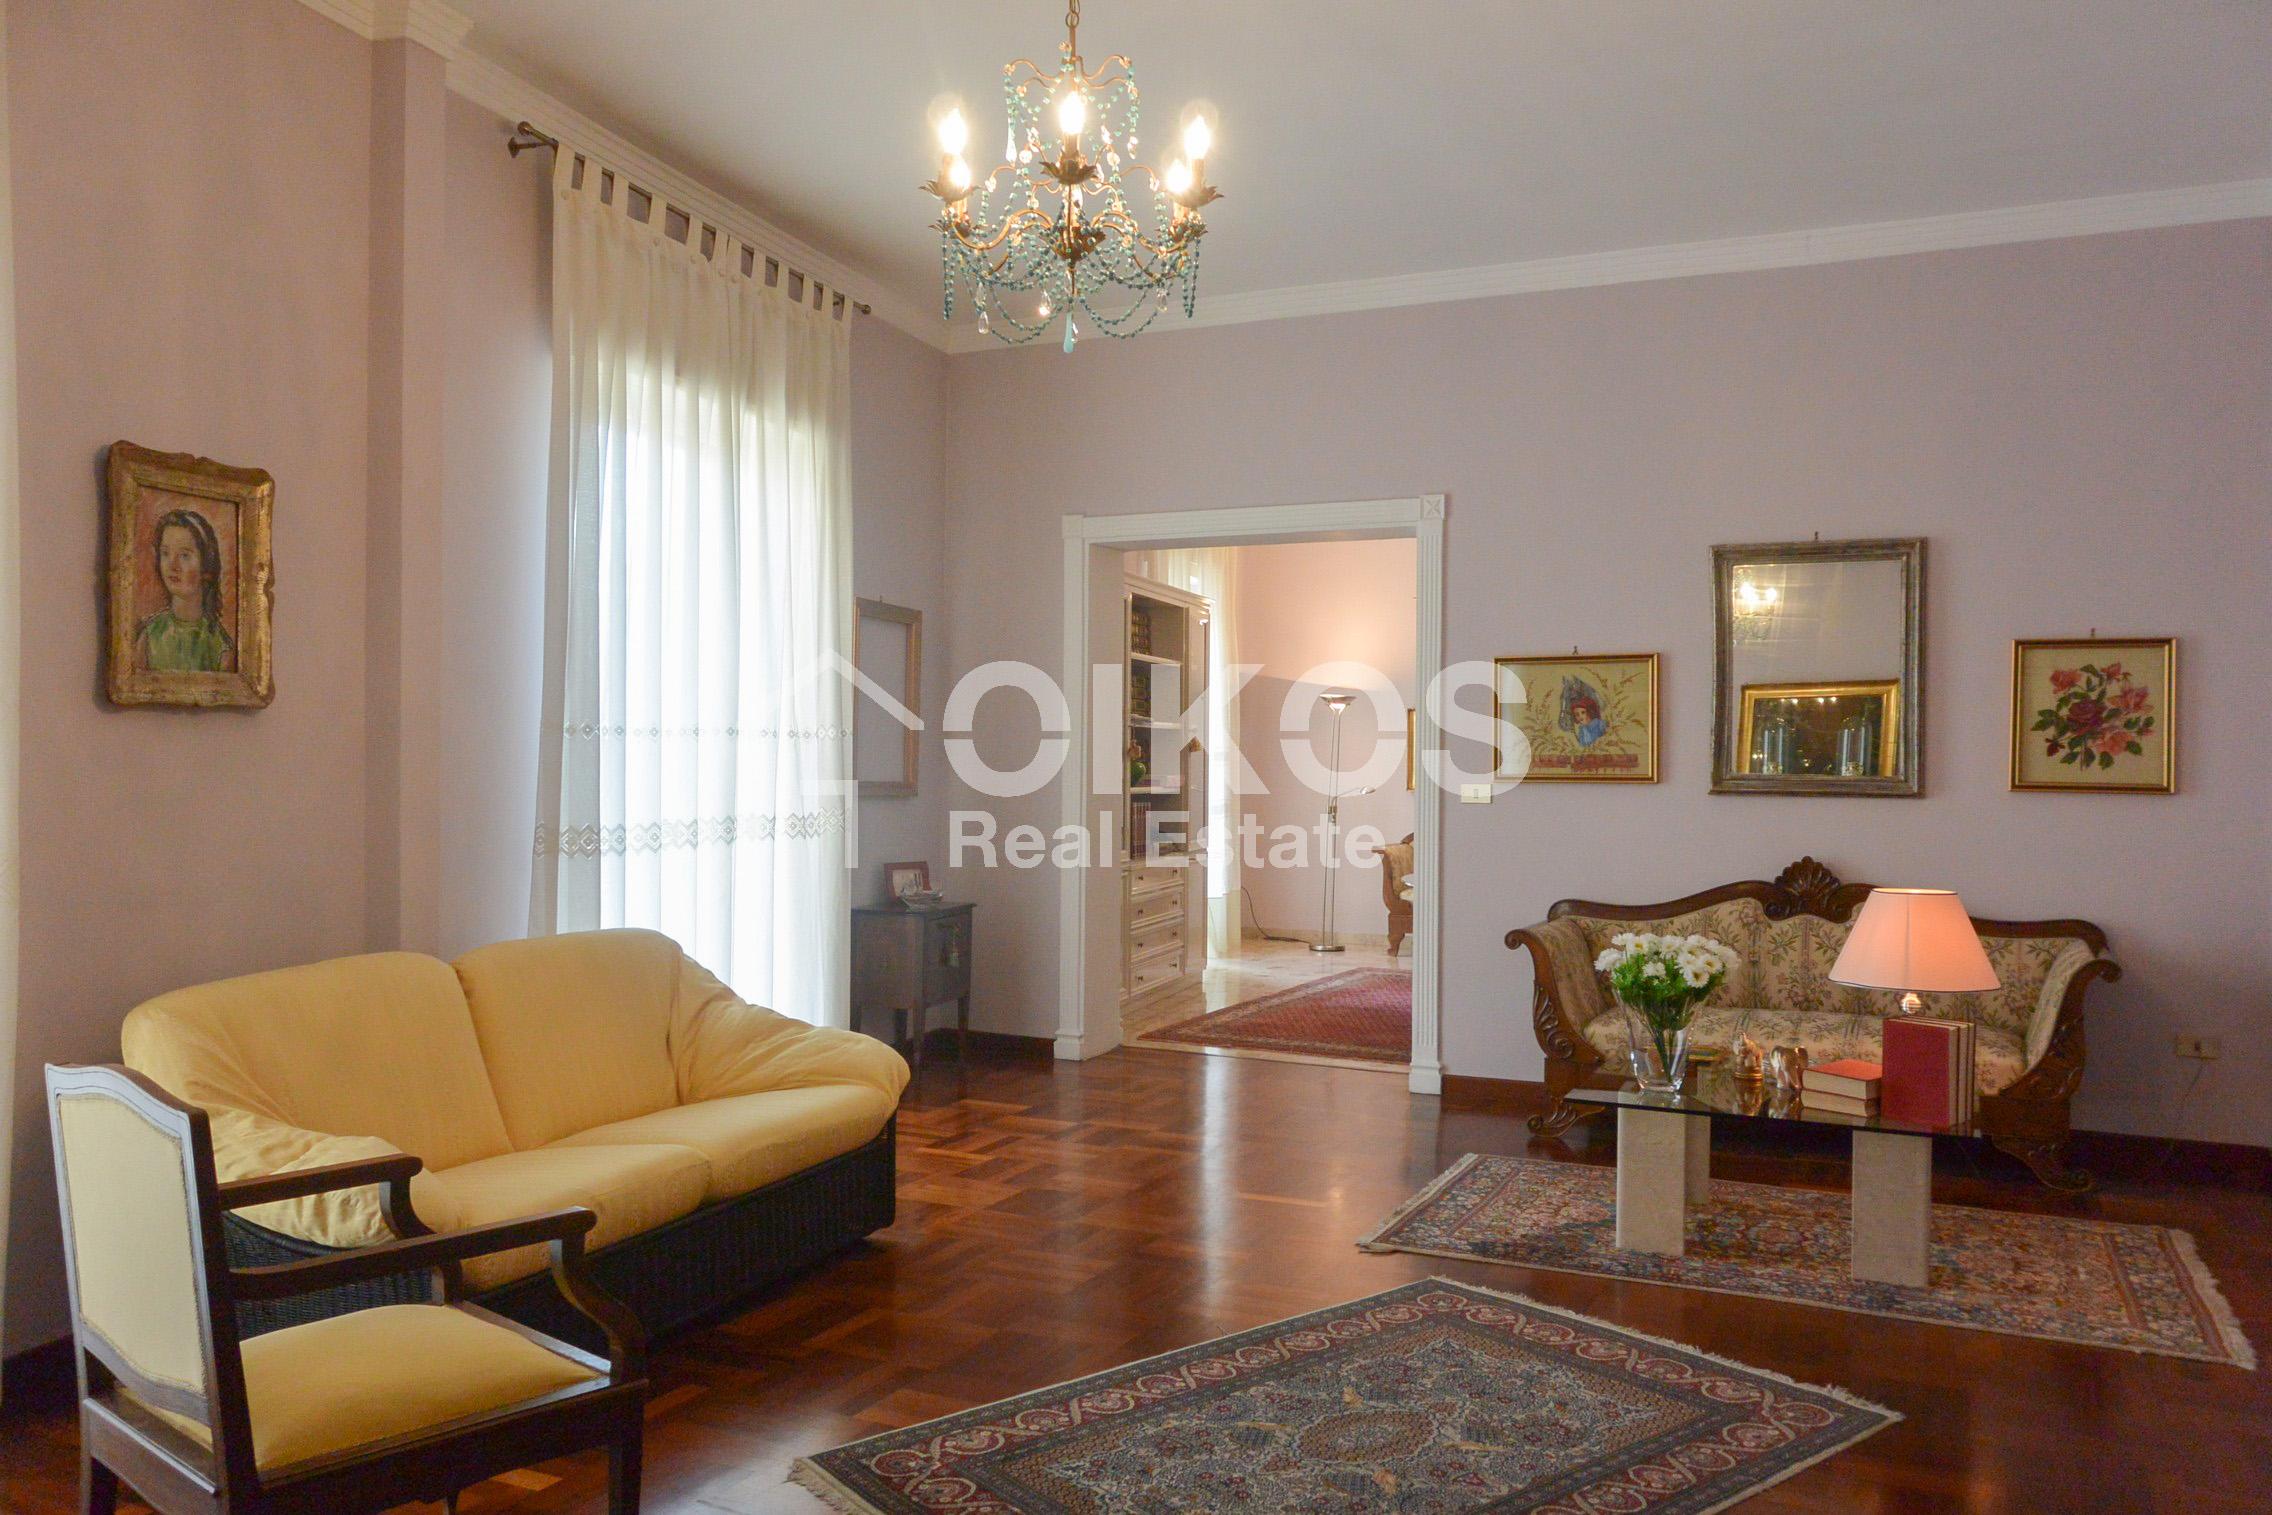 Appartamento con garage in via Vespucci 03